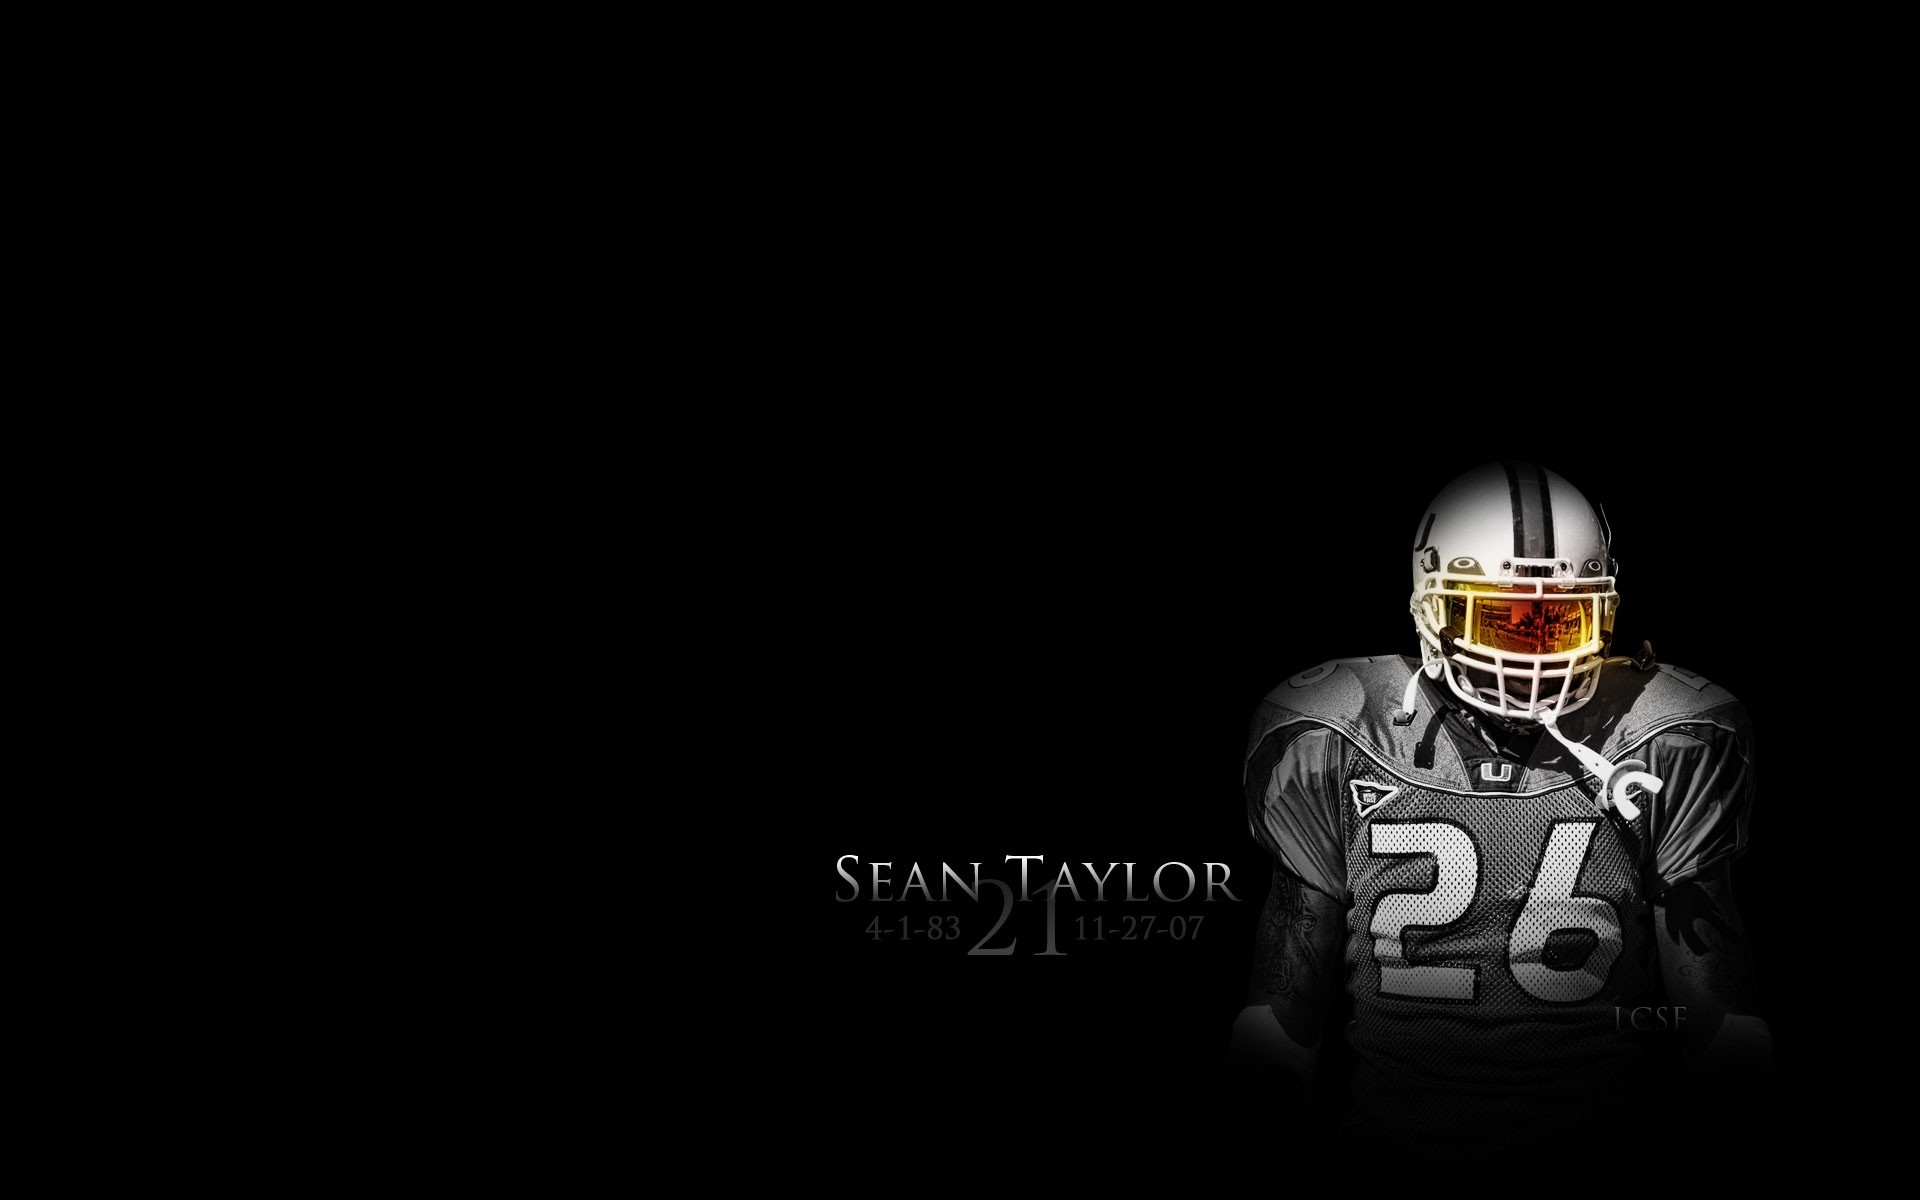 Sean Taylor Miami Hurricanes, redskins, washington, HD .